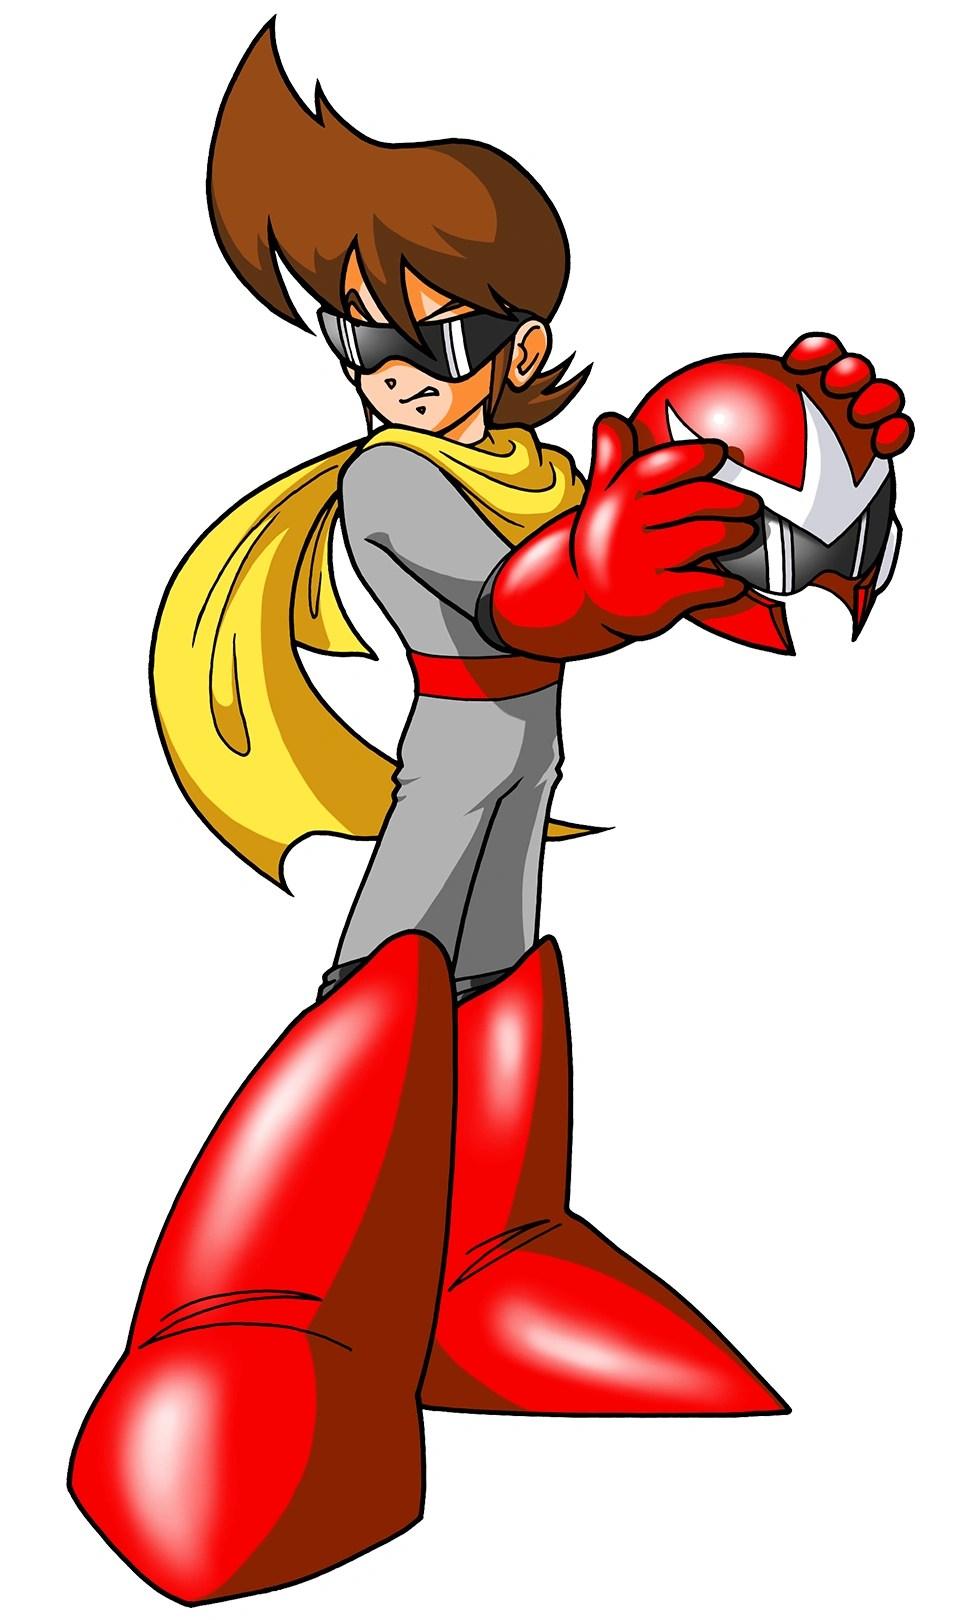 Image Helmetless Protomanpng MMKB The Mega Man